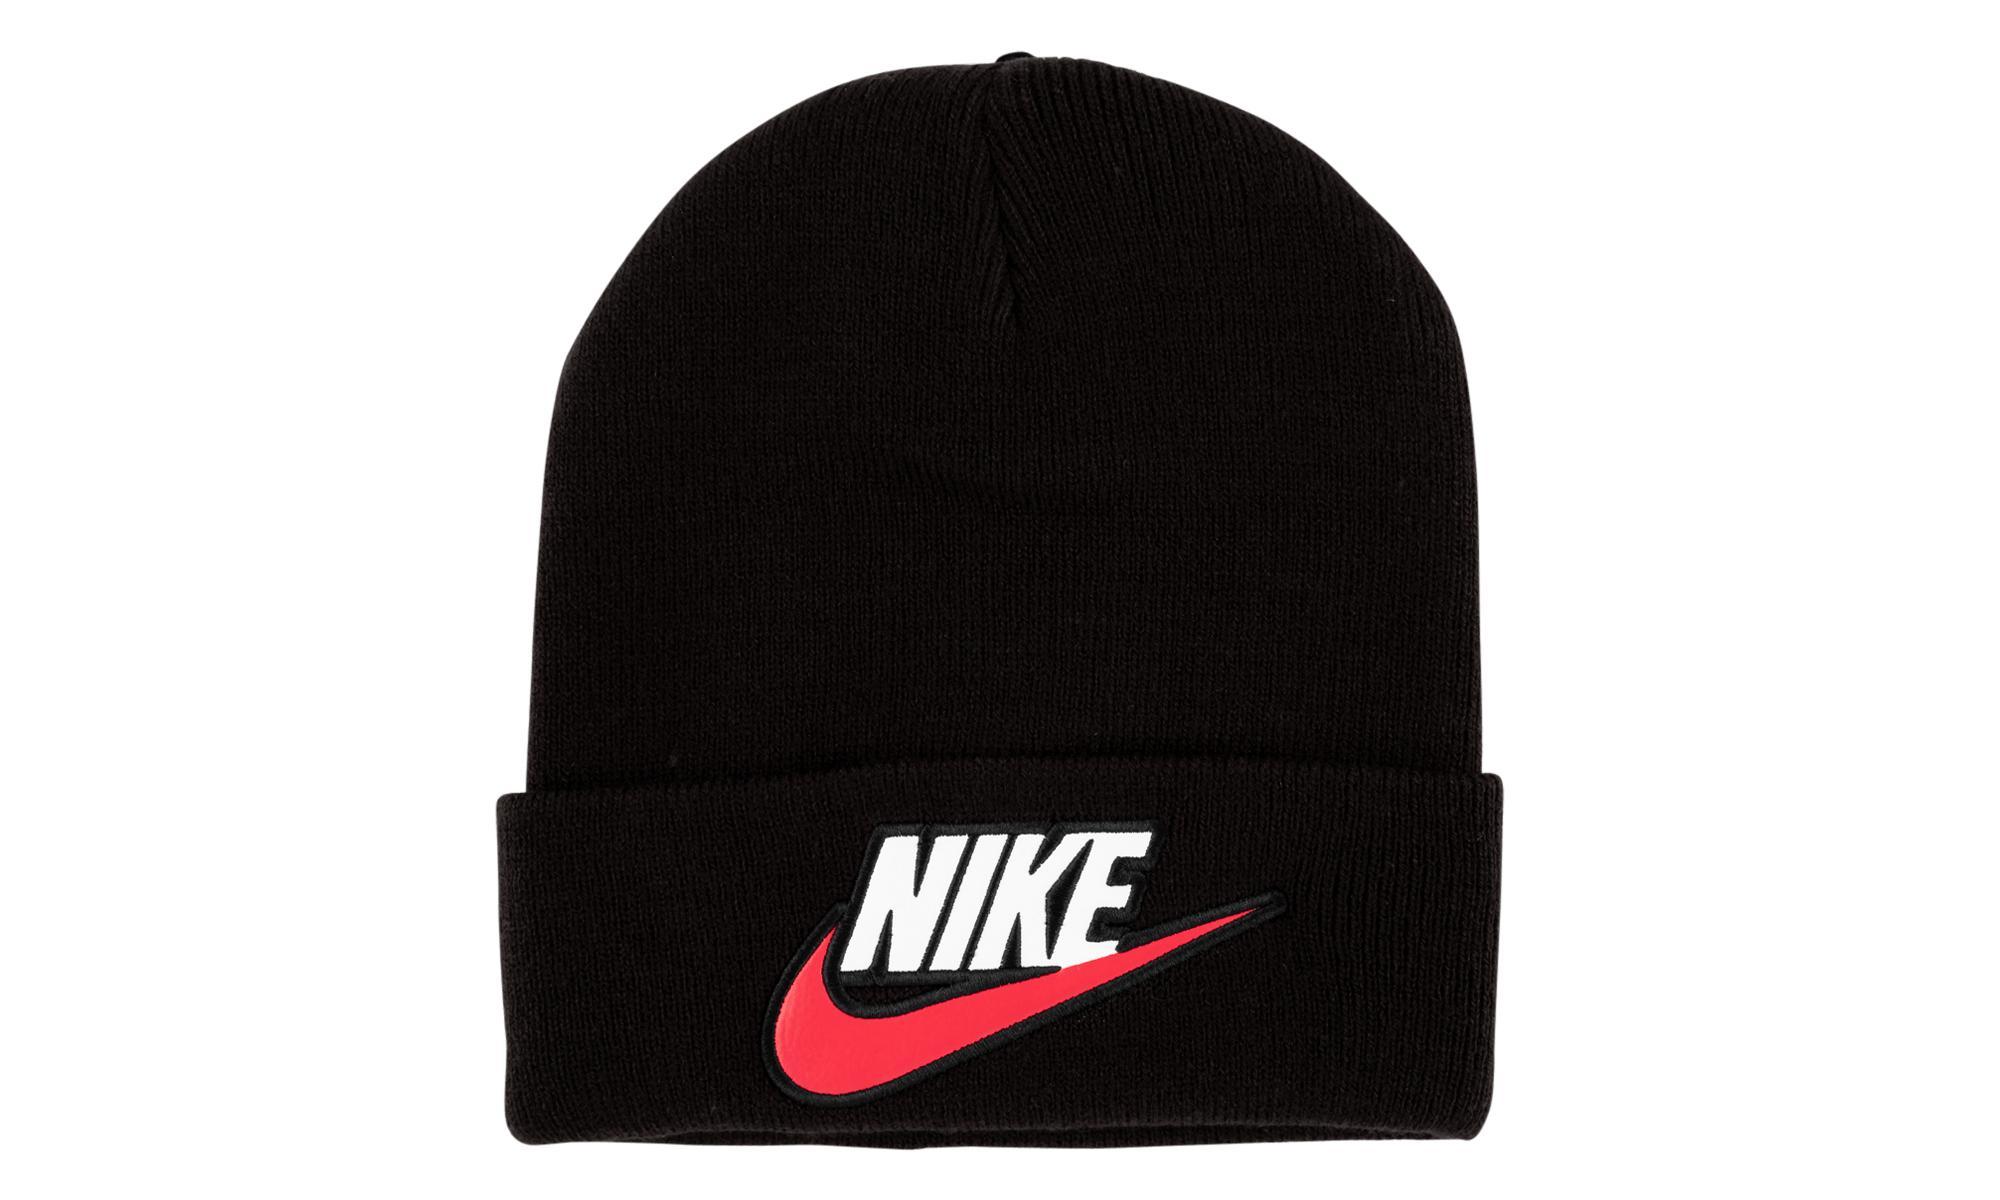 Lyst - Supreme Nike Beanie in Black for Men d306b934f566